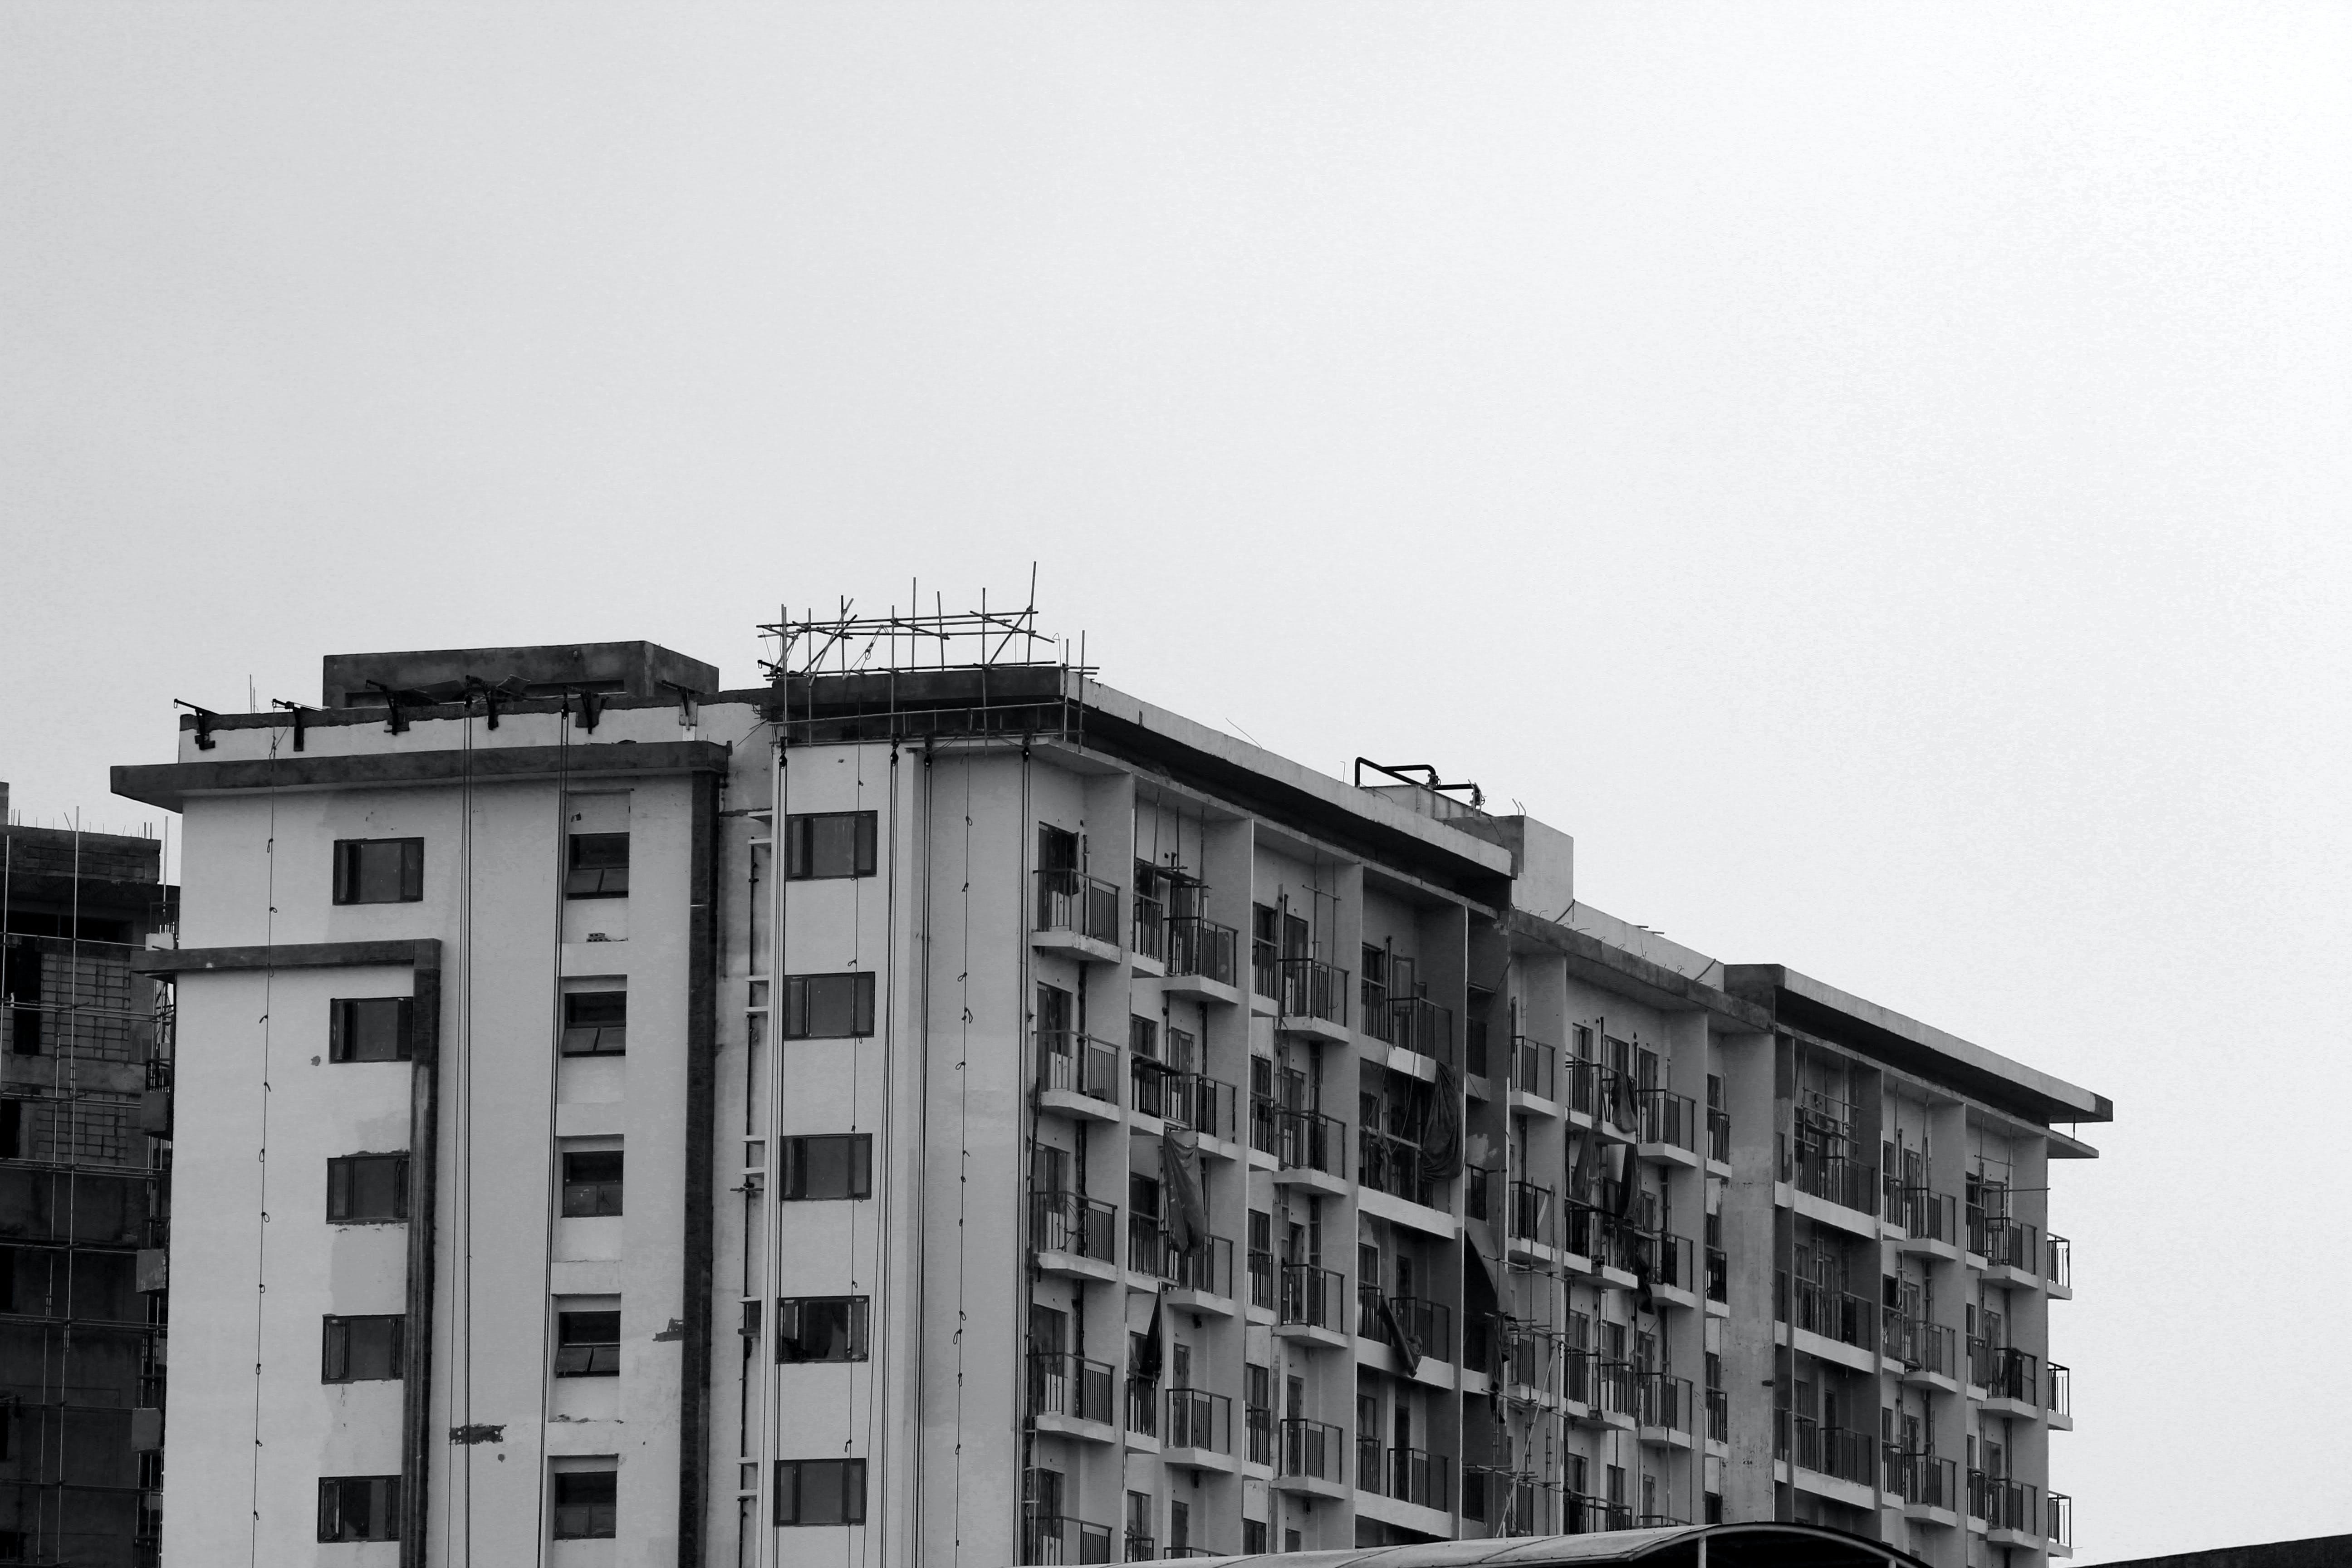 Free stock photo of Archintecture, building, condominium, construction